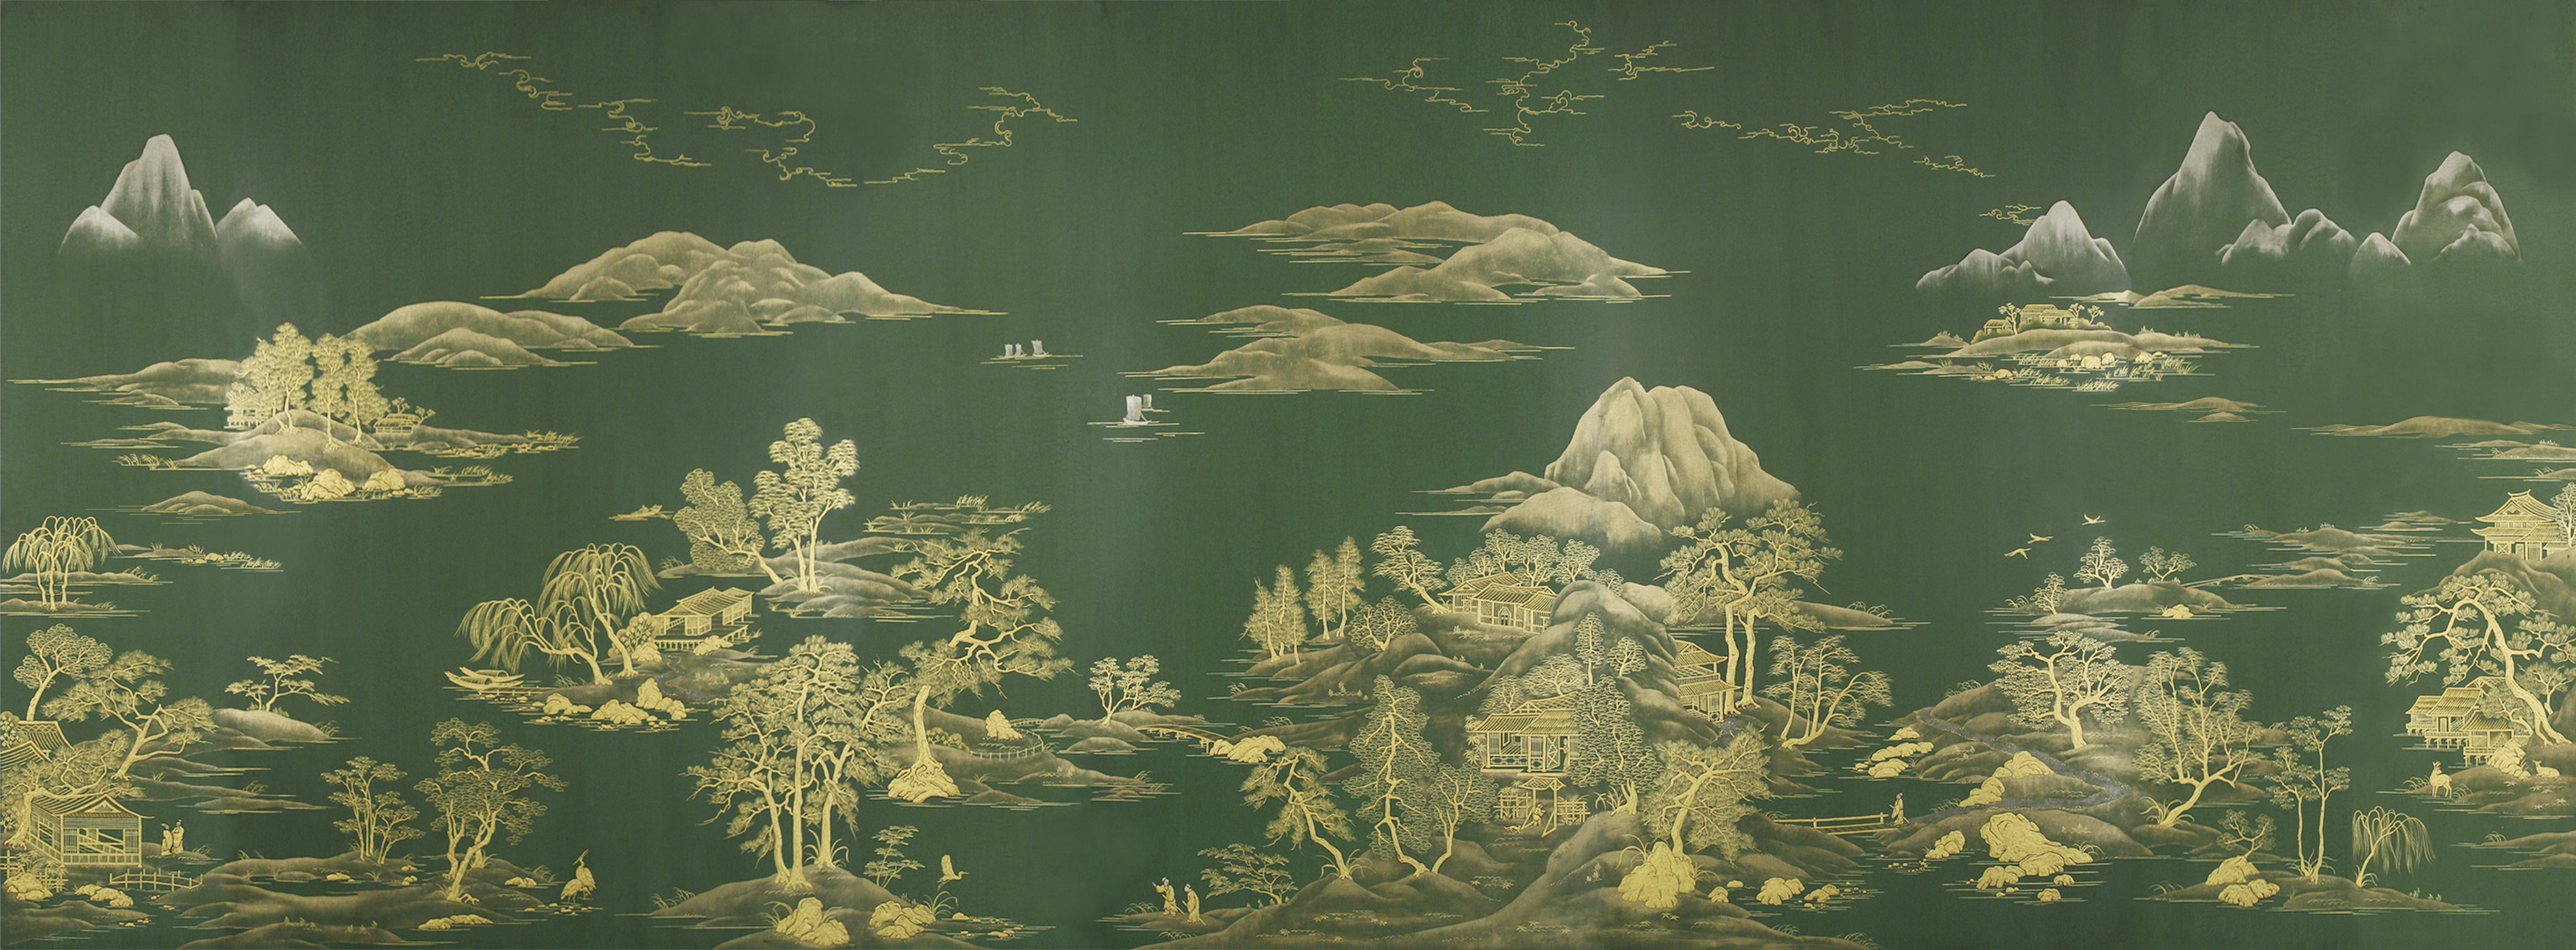 green-lacquer-mural-wpl.jpg (4229×1560)